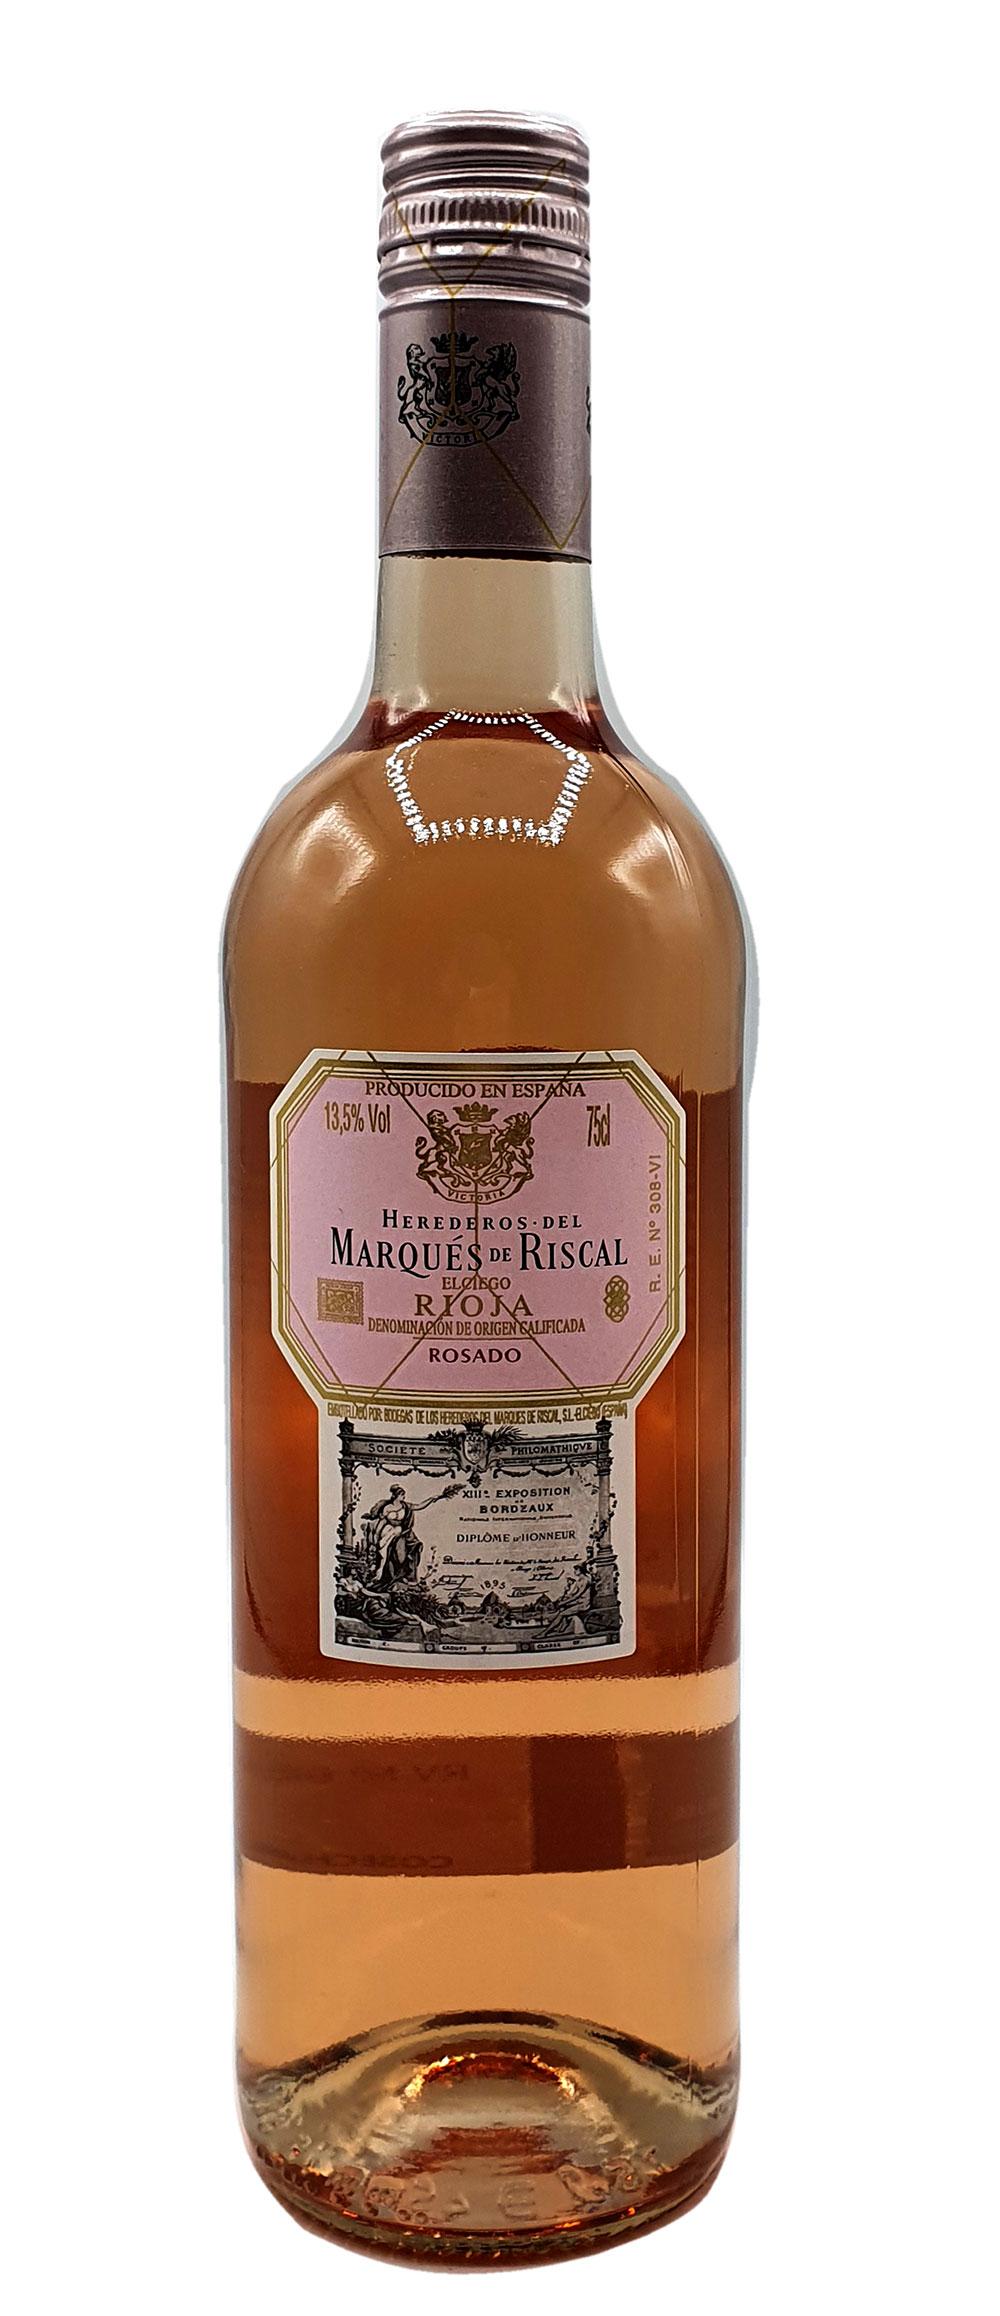 Rose Wein - Marques de Riscal Rioja Rosado 750ml (13,5% Vol)- [Enthält Sulfite]